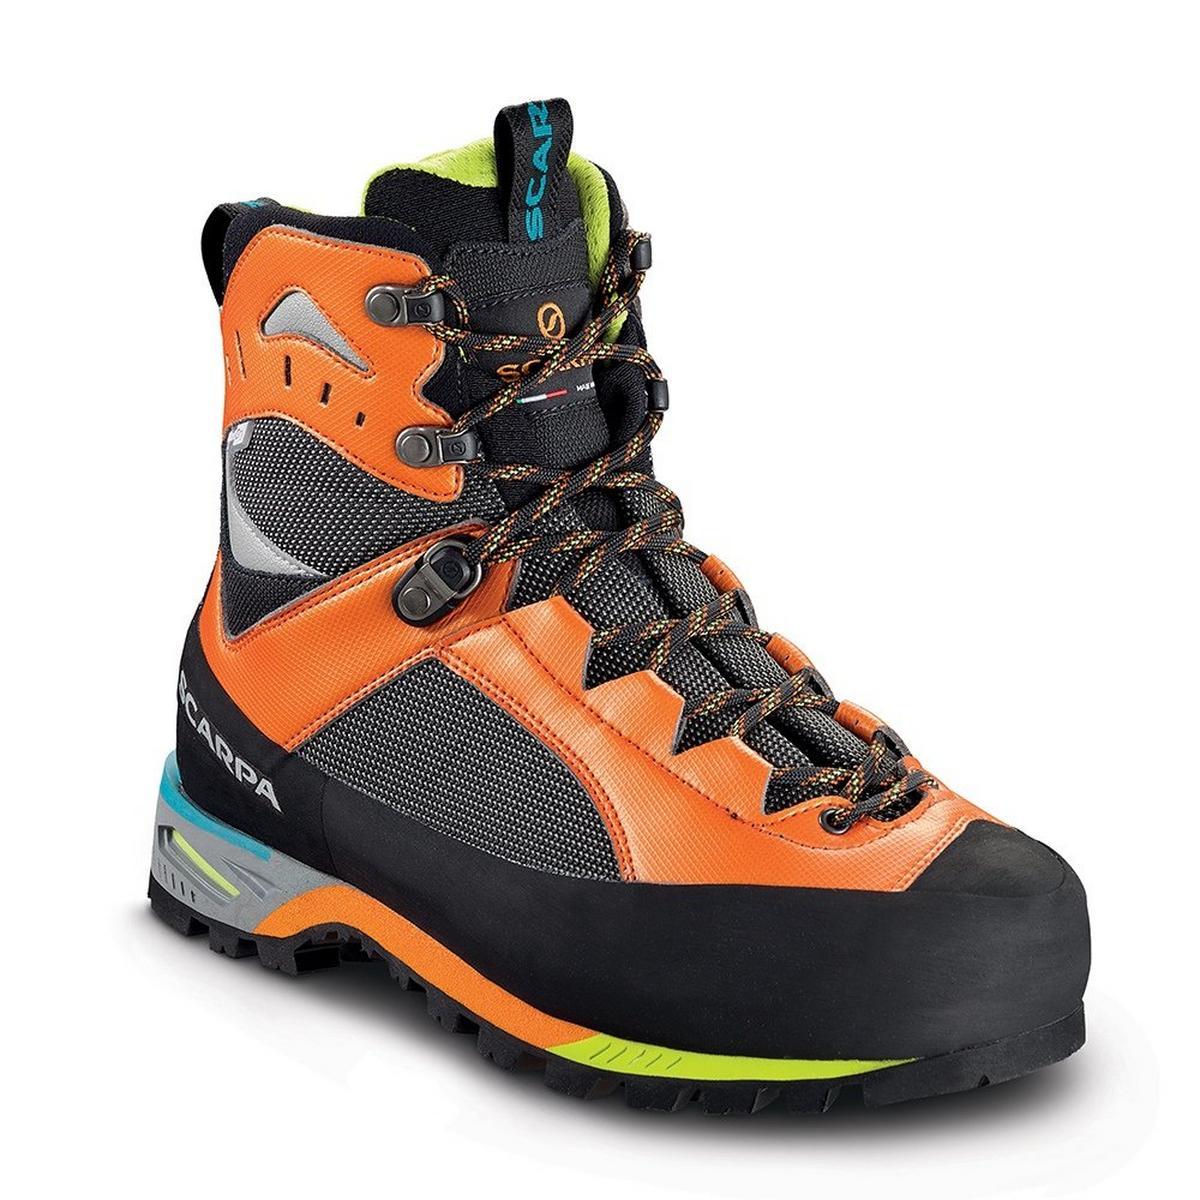 Scarpa Boots Men's Charmoz OutDry 1051 Shark/Orange (42-48)